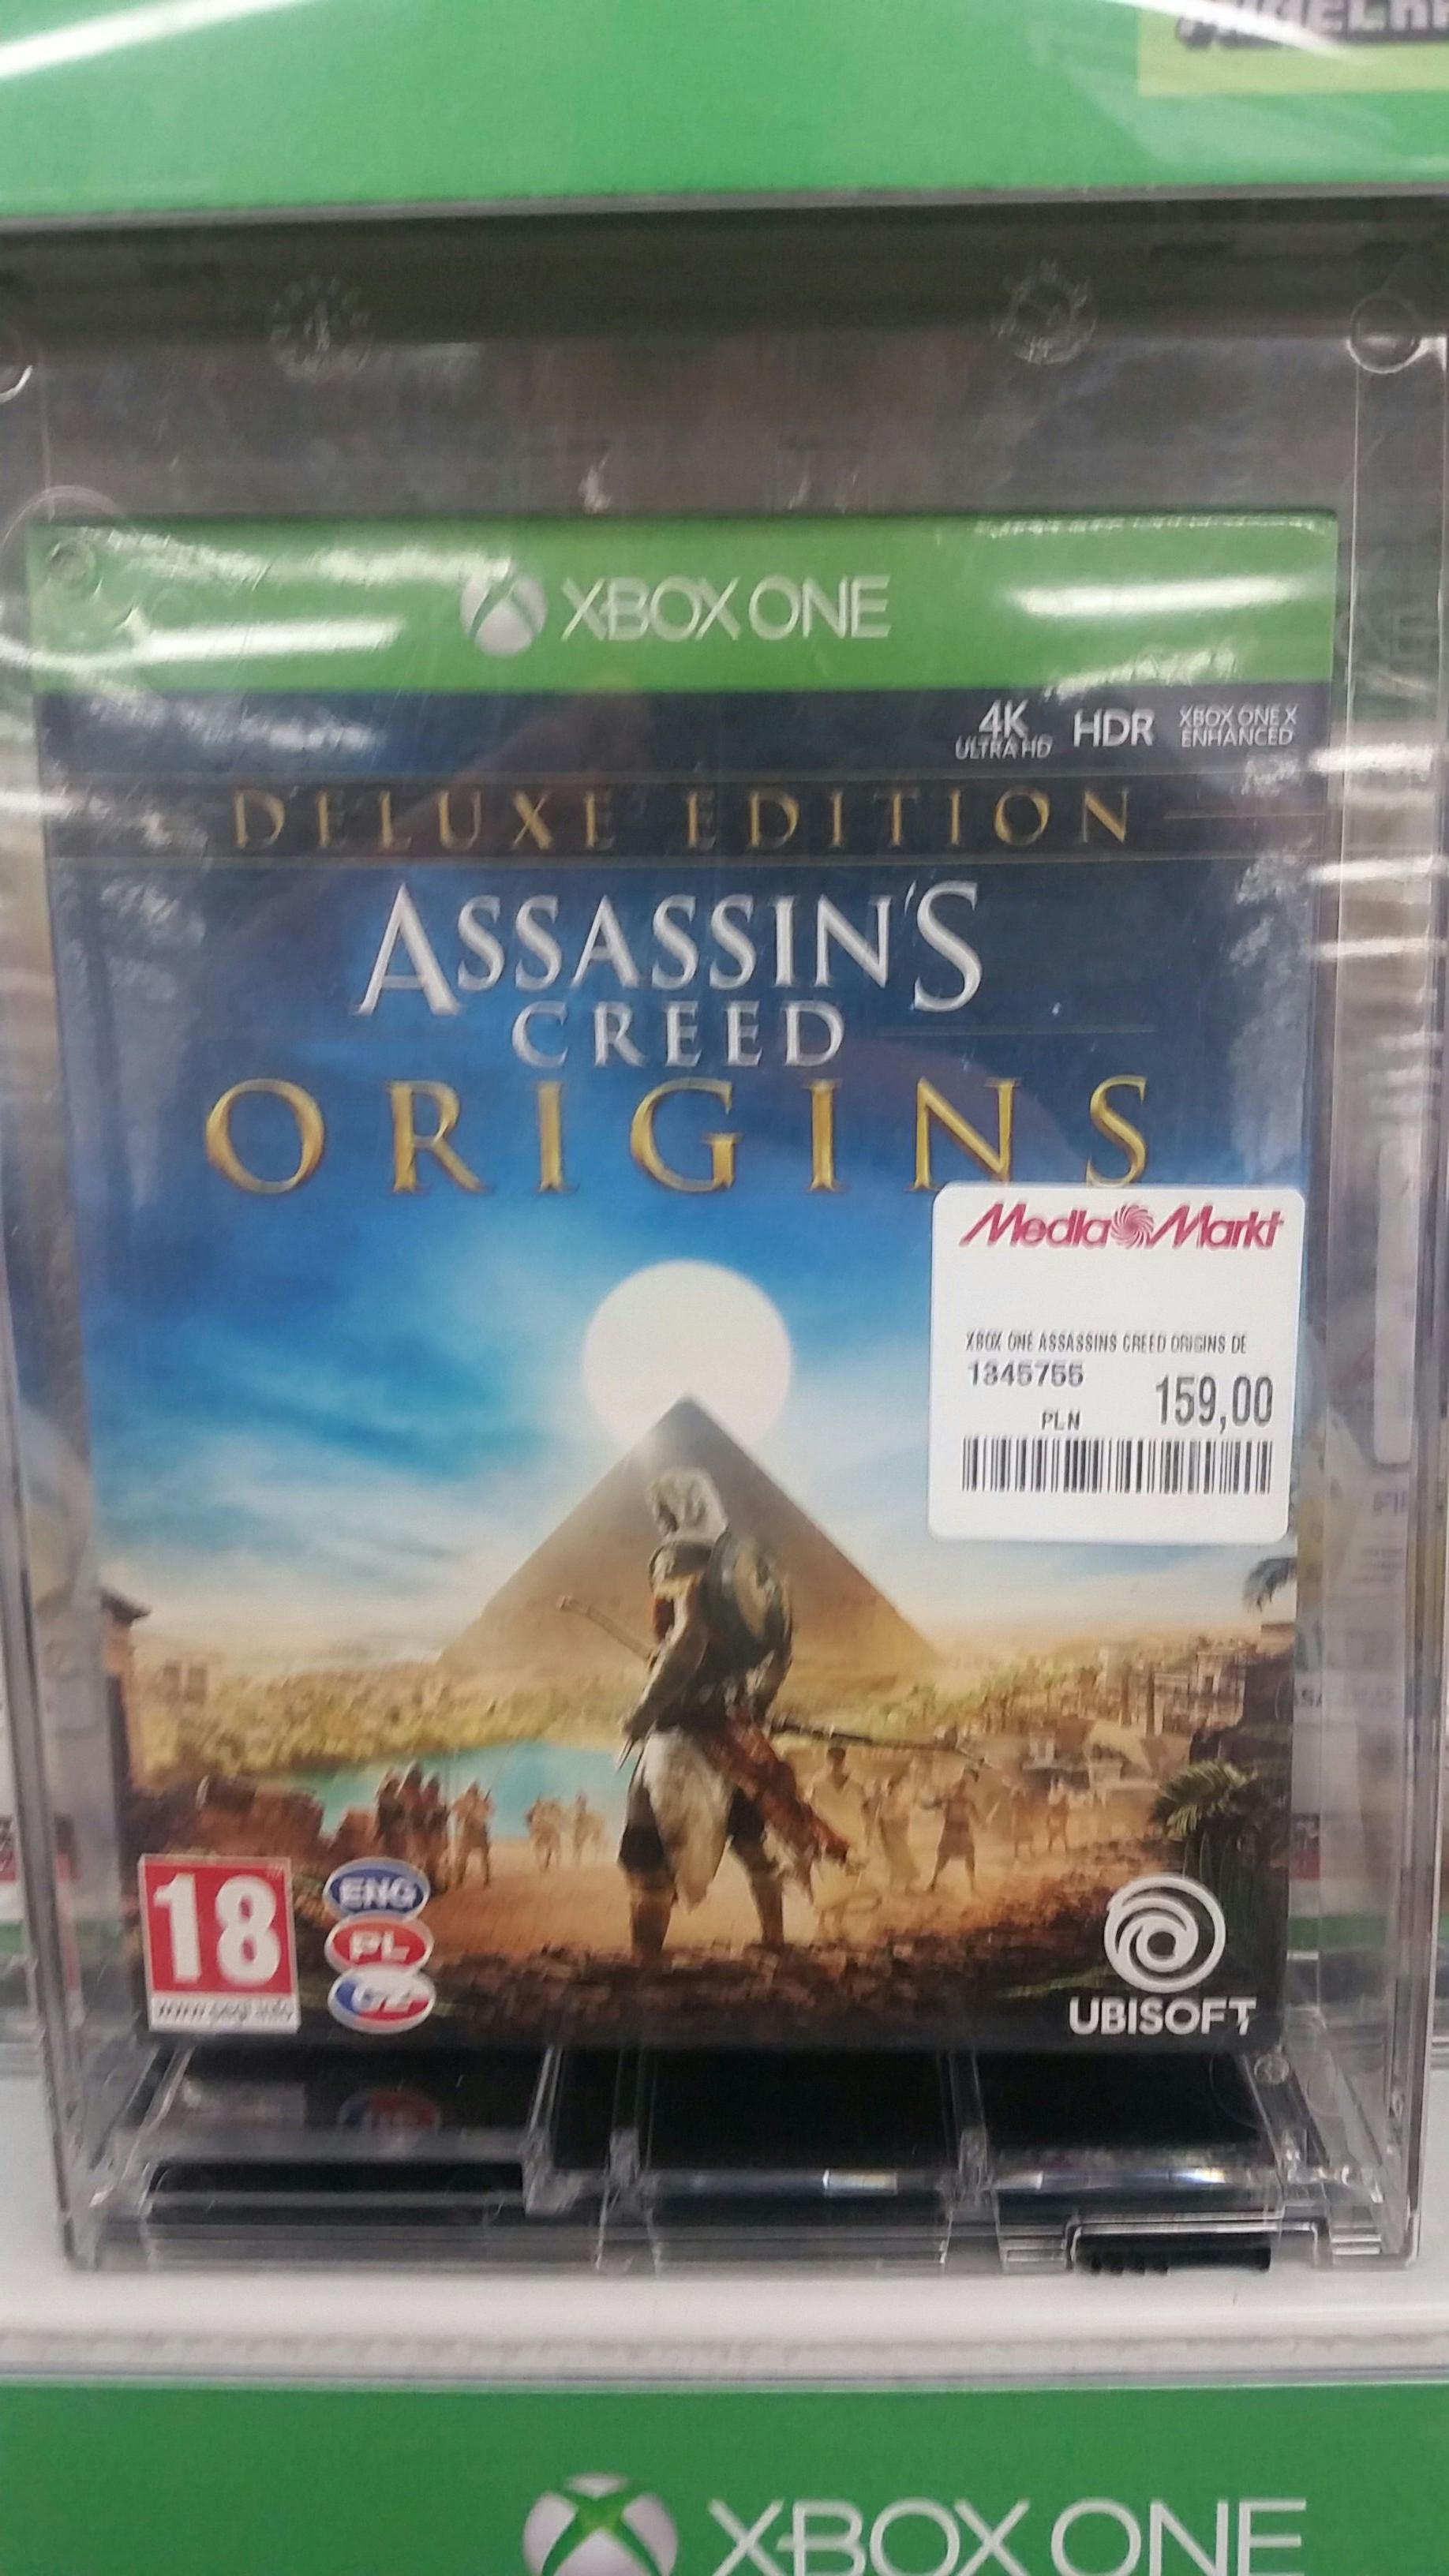 Assassin's Creed Origins Edycja Deluxe na PS4 i Xbox One za 159 w Saturn i Mediamarkt